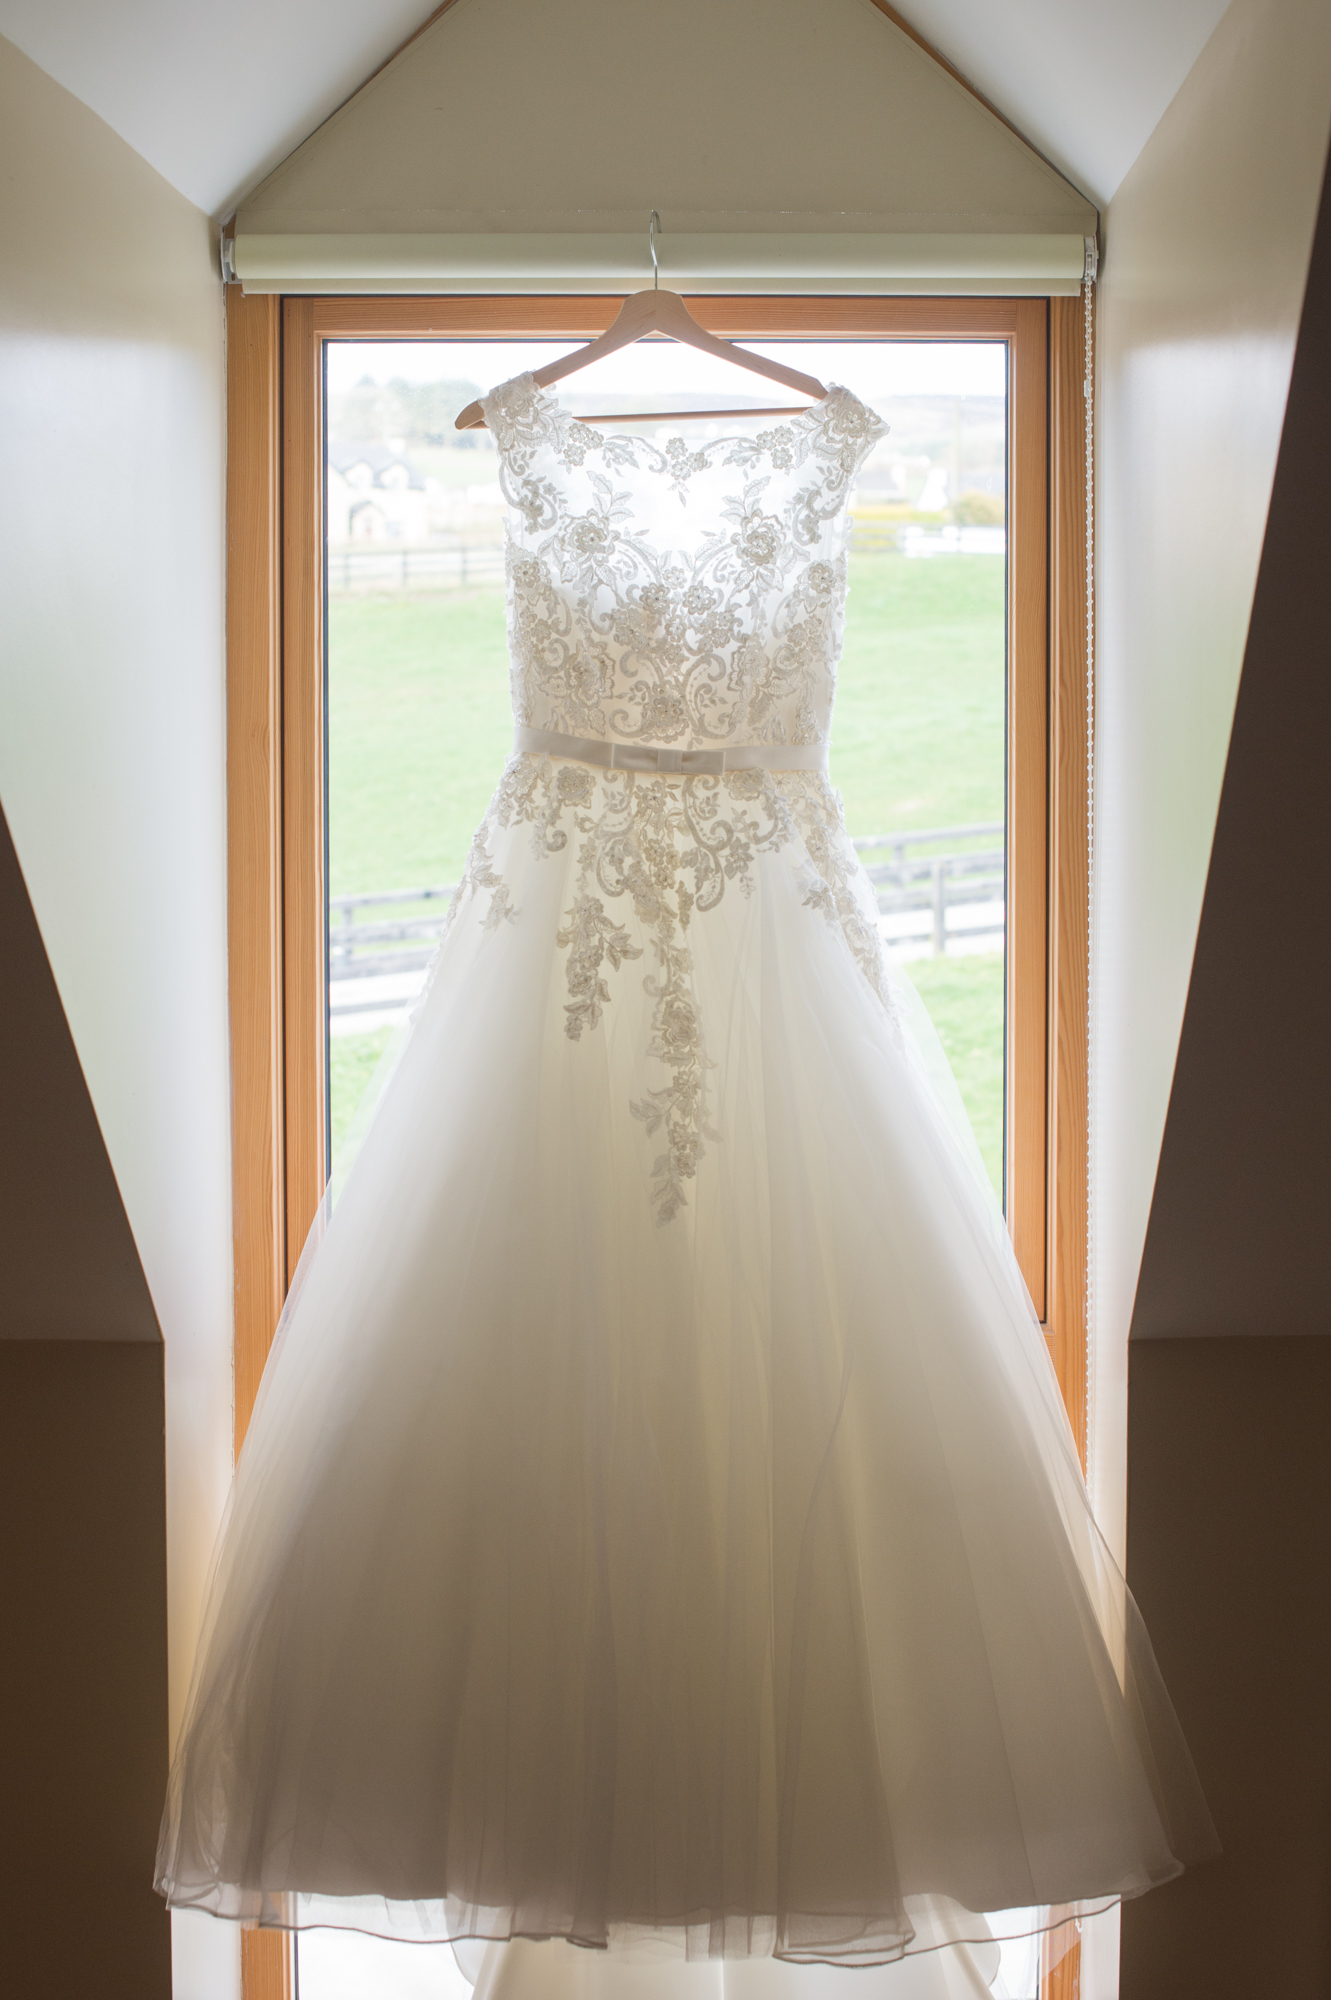 Michael_Gill_Photography_Wedding_Greencastle_Lousie_Jason_Donegal-2.jpg